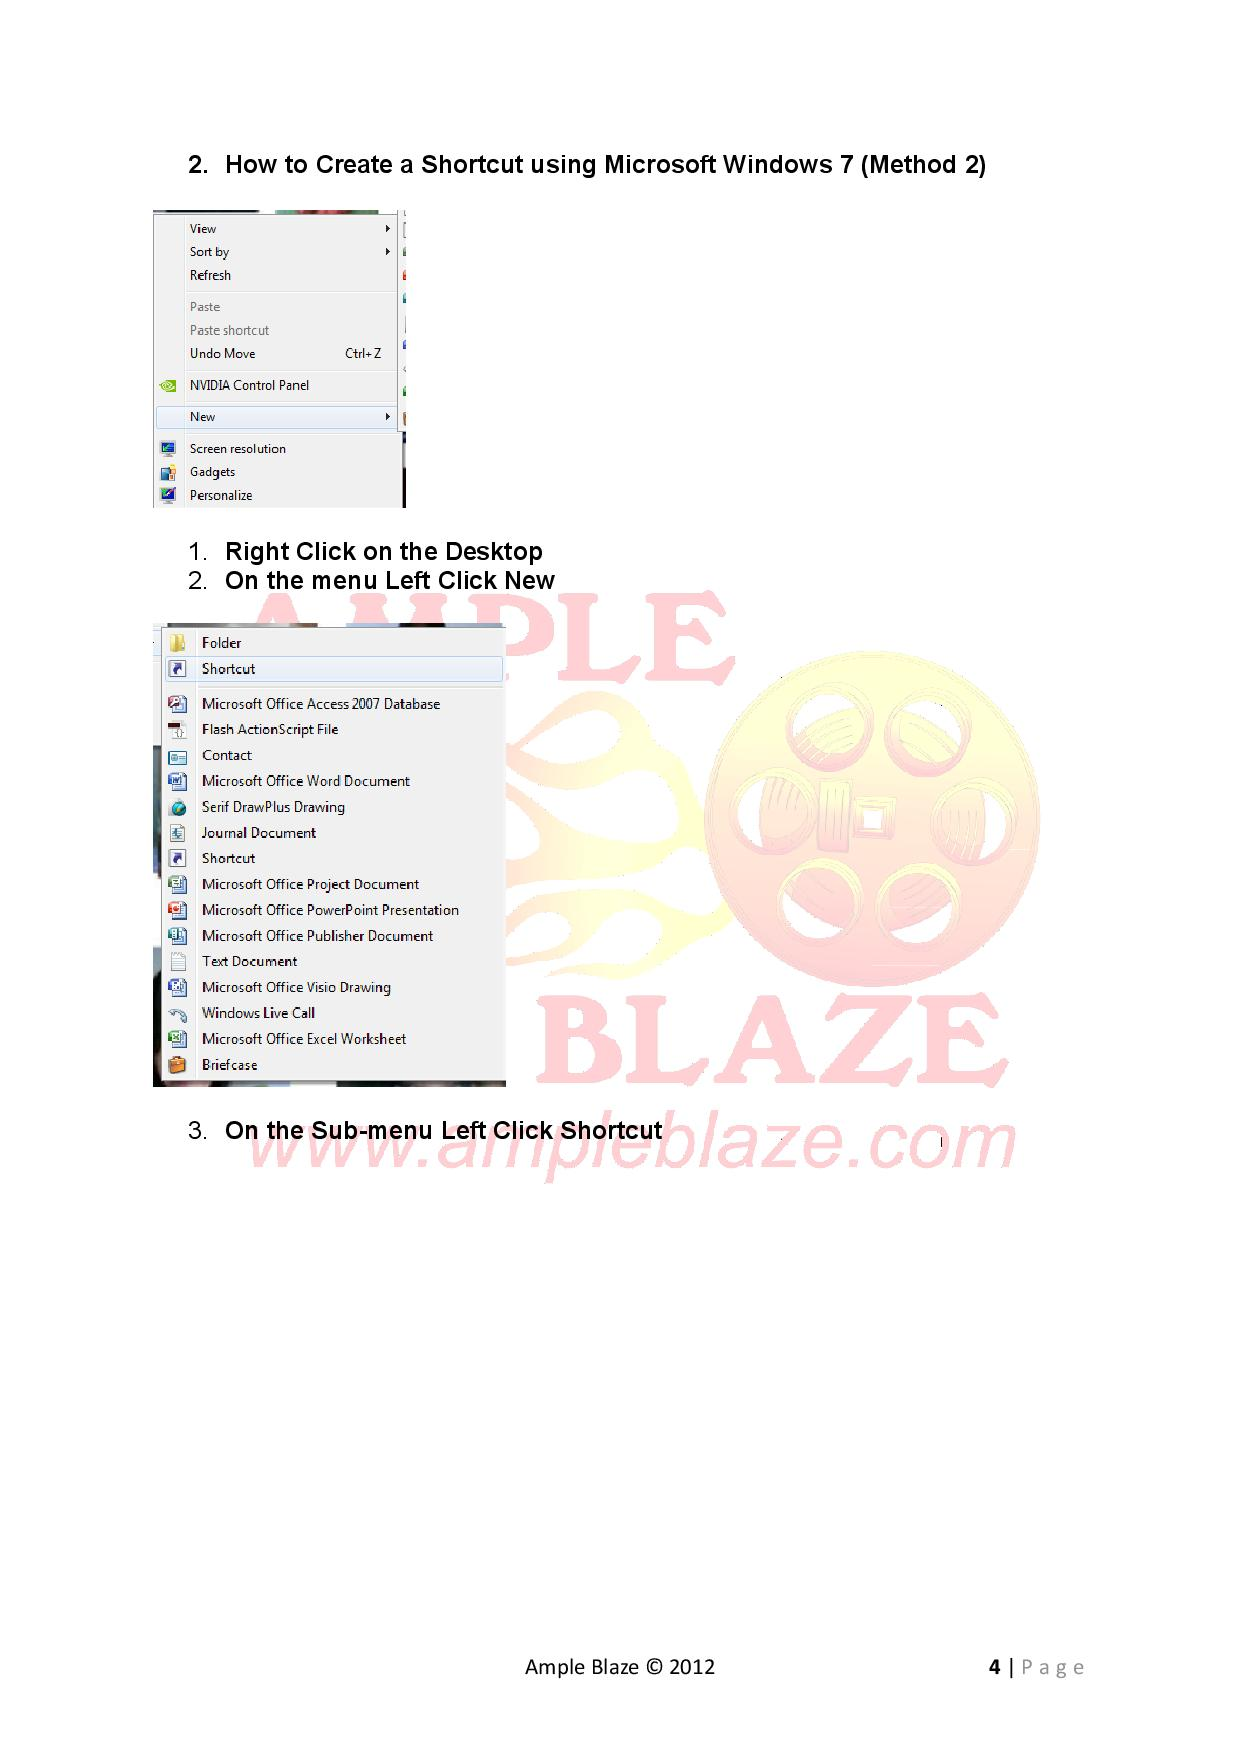 Ample Blaze Create Shortcut Windows 7-page-004